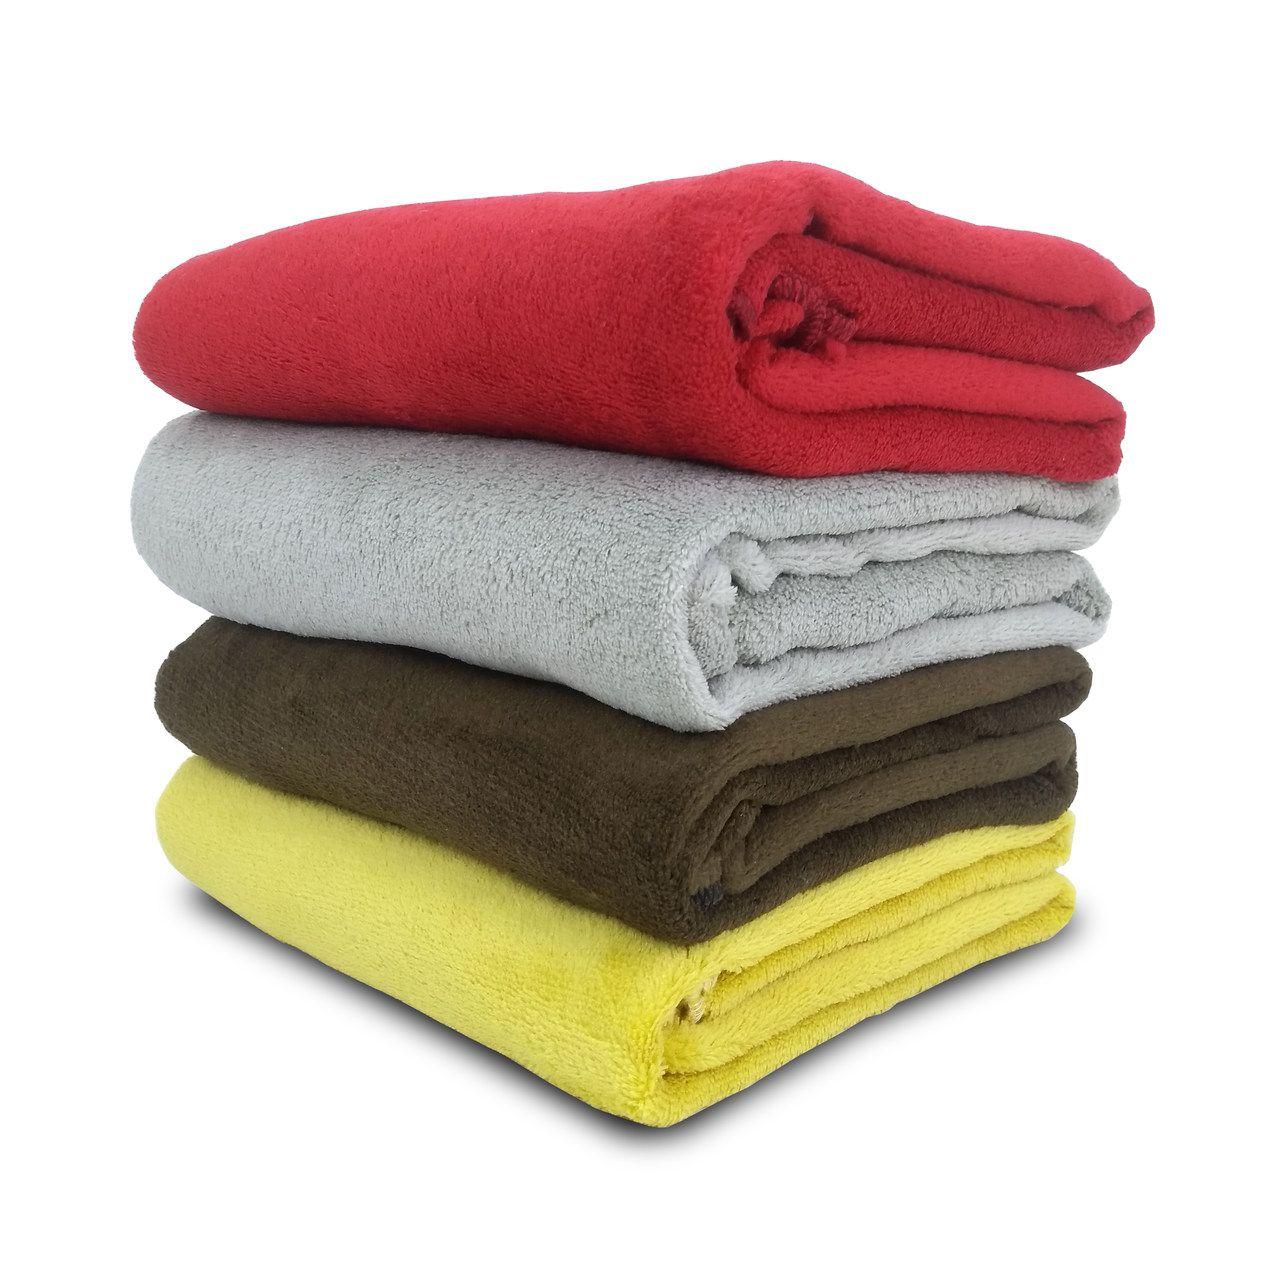 Kit 4 Cobertor Manta Pet Fleece Gato Cães 1,10 x 0,90m Amarelo - Berve Enxovais